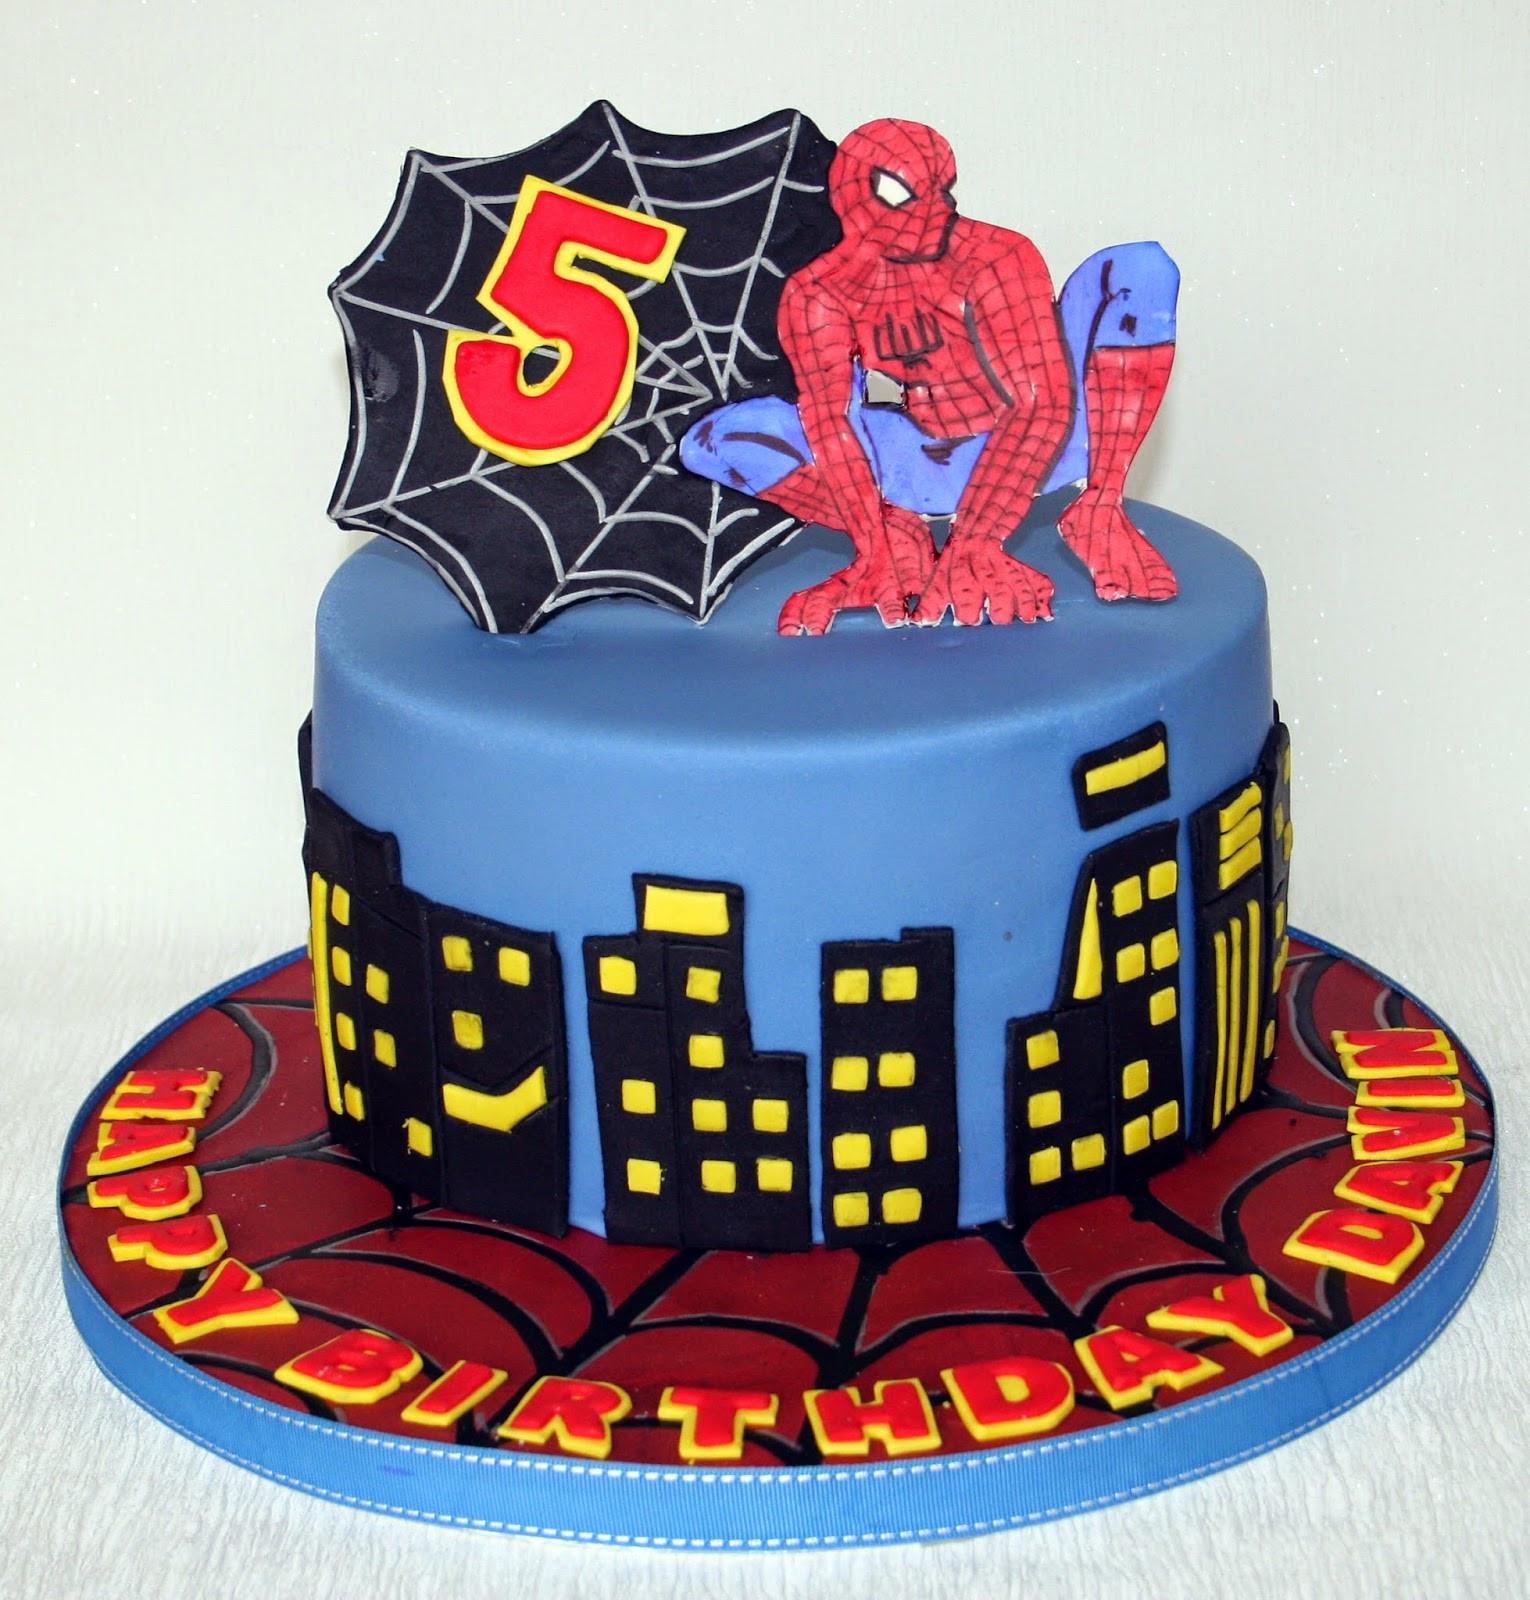 Spiderman Birthday Cakes  The Perfectionist Confectionist Davin Spiderman